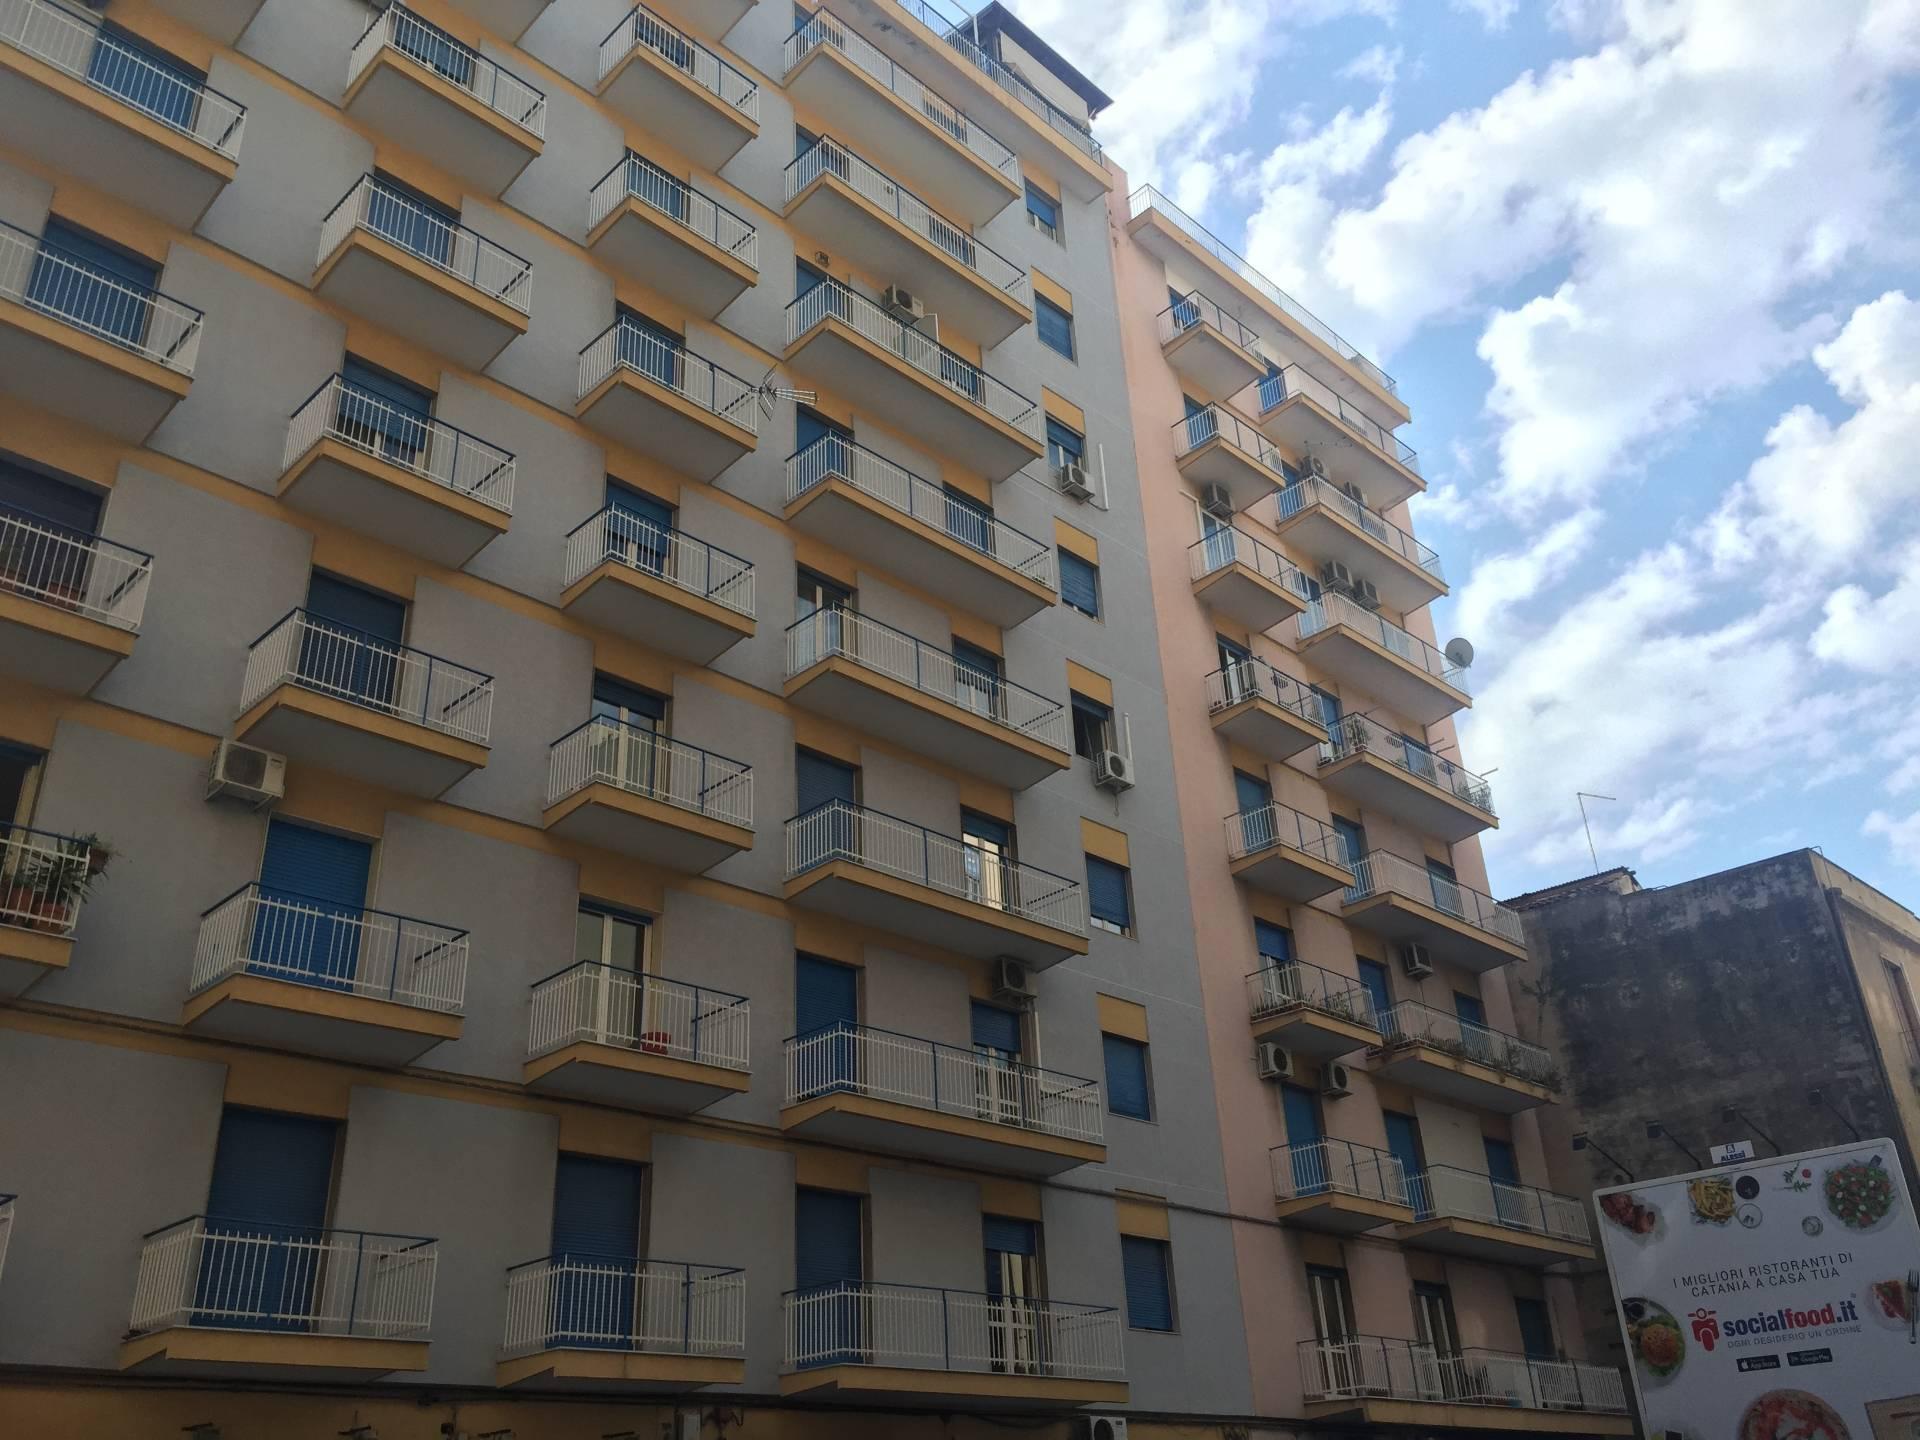 catania vendita quart: zona centro studio-catania-centro-sas-di-corallo-gaetana-&-c